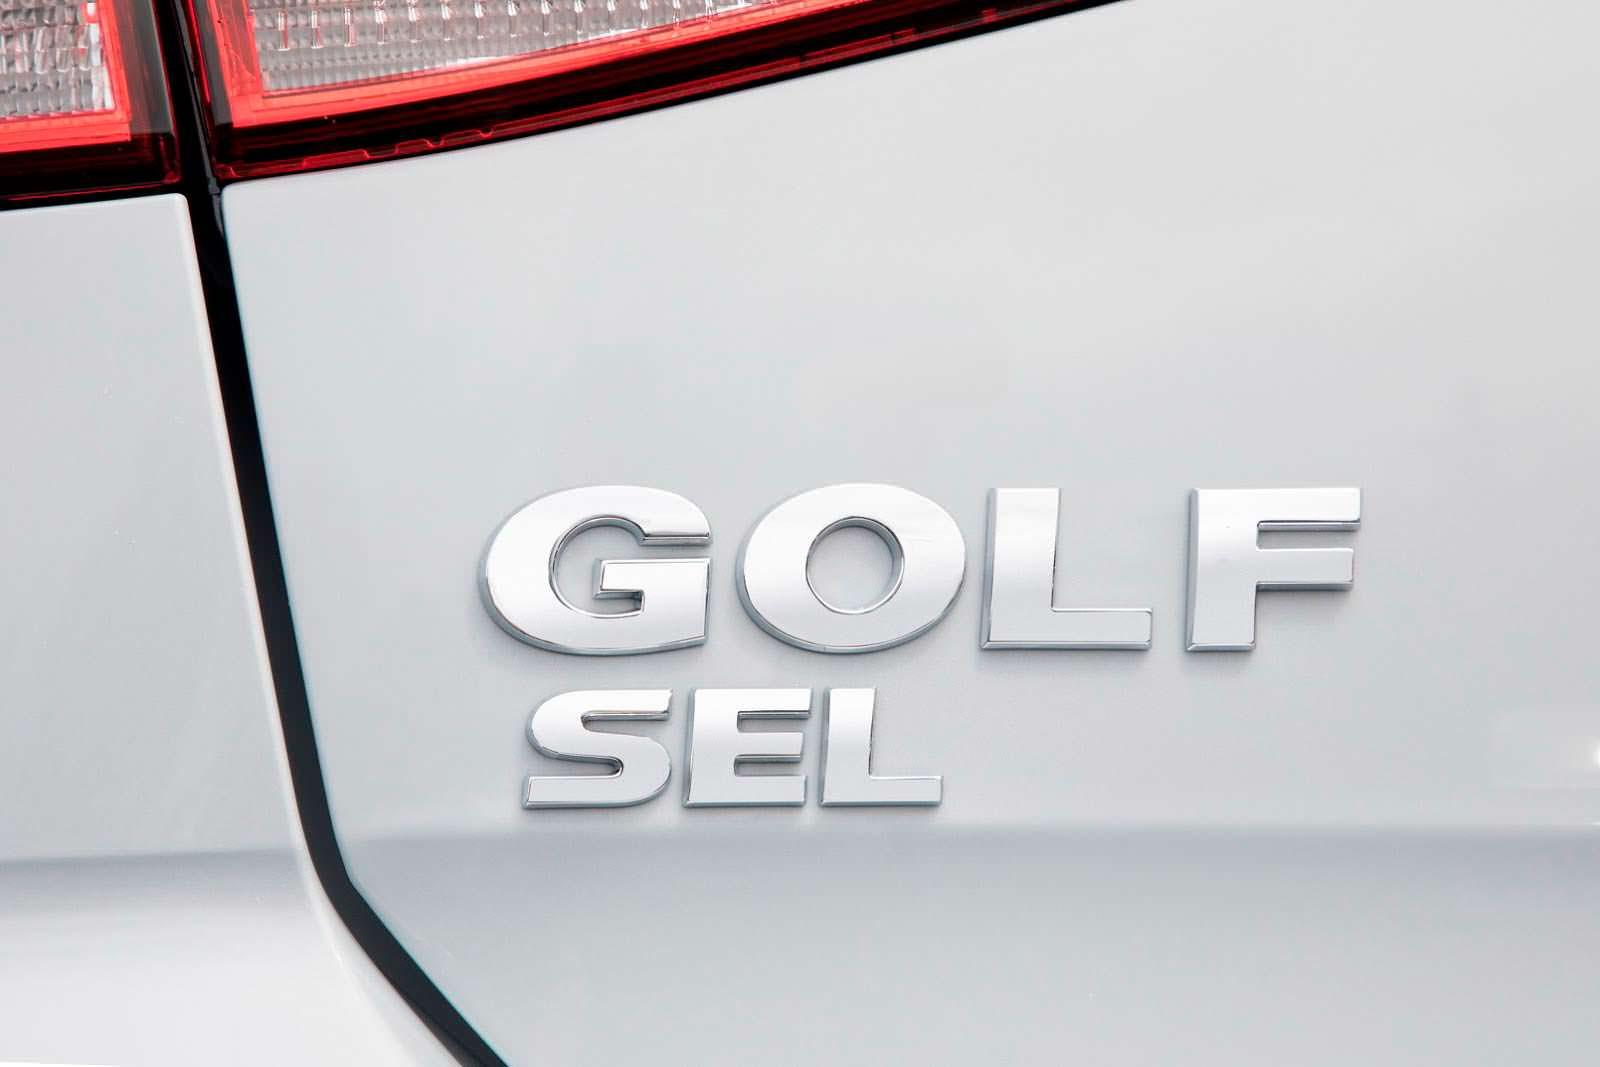 Фото | Надпись Volkswagen Golf SEL для рынка США